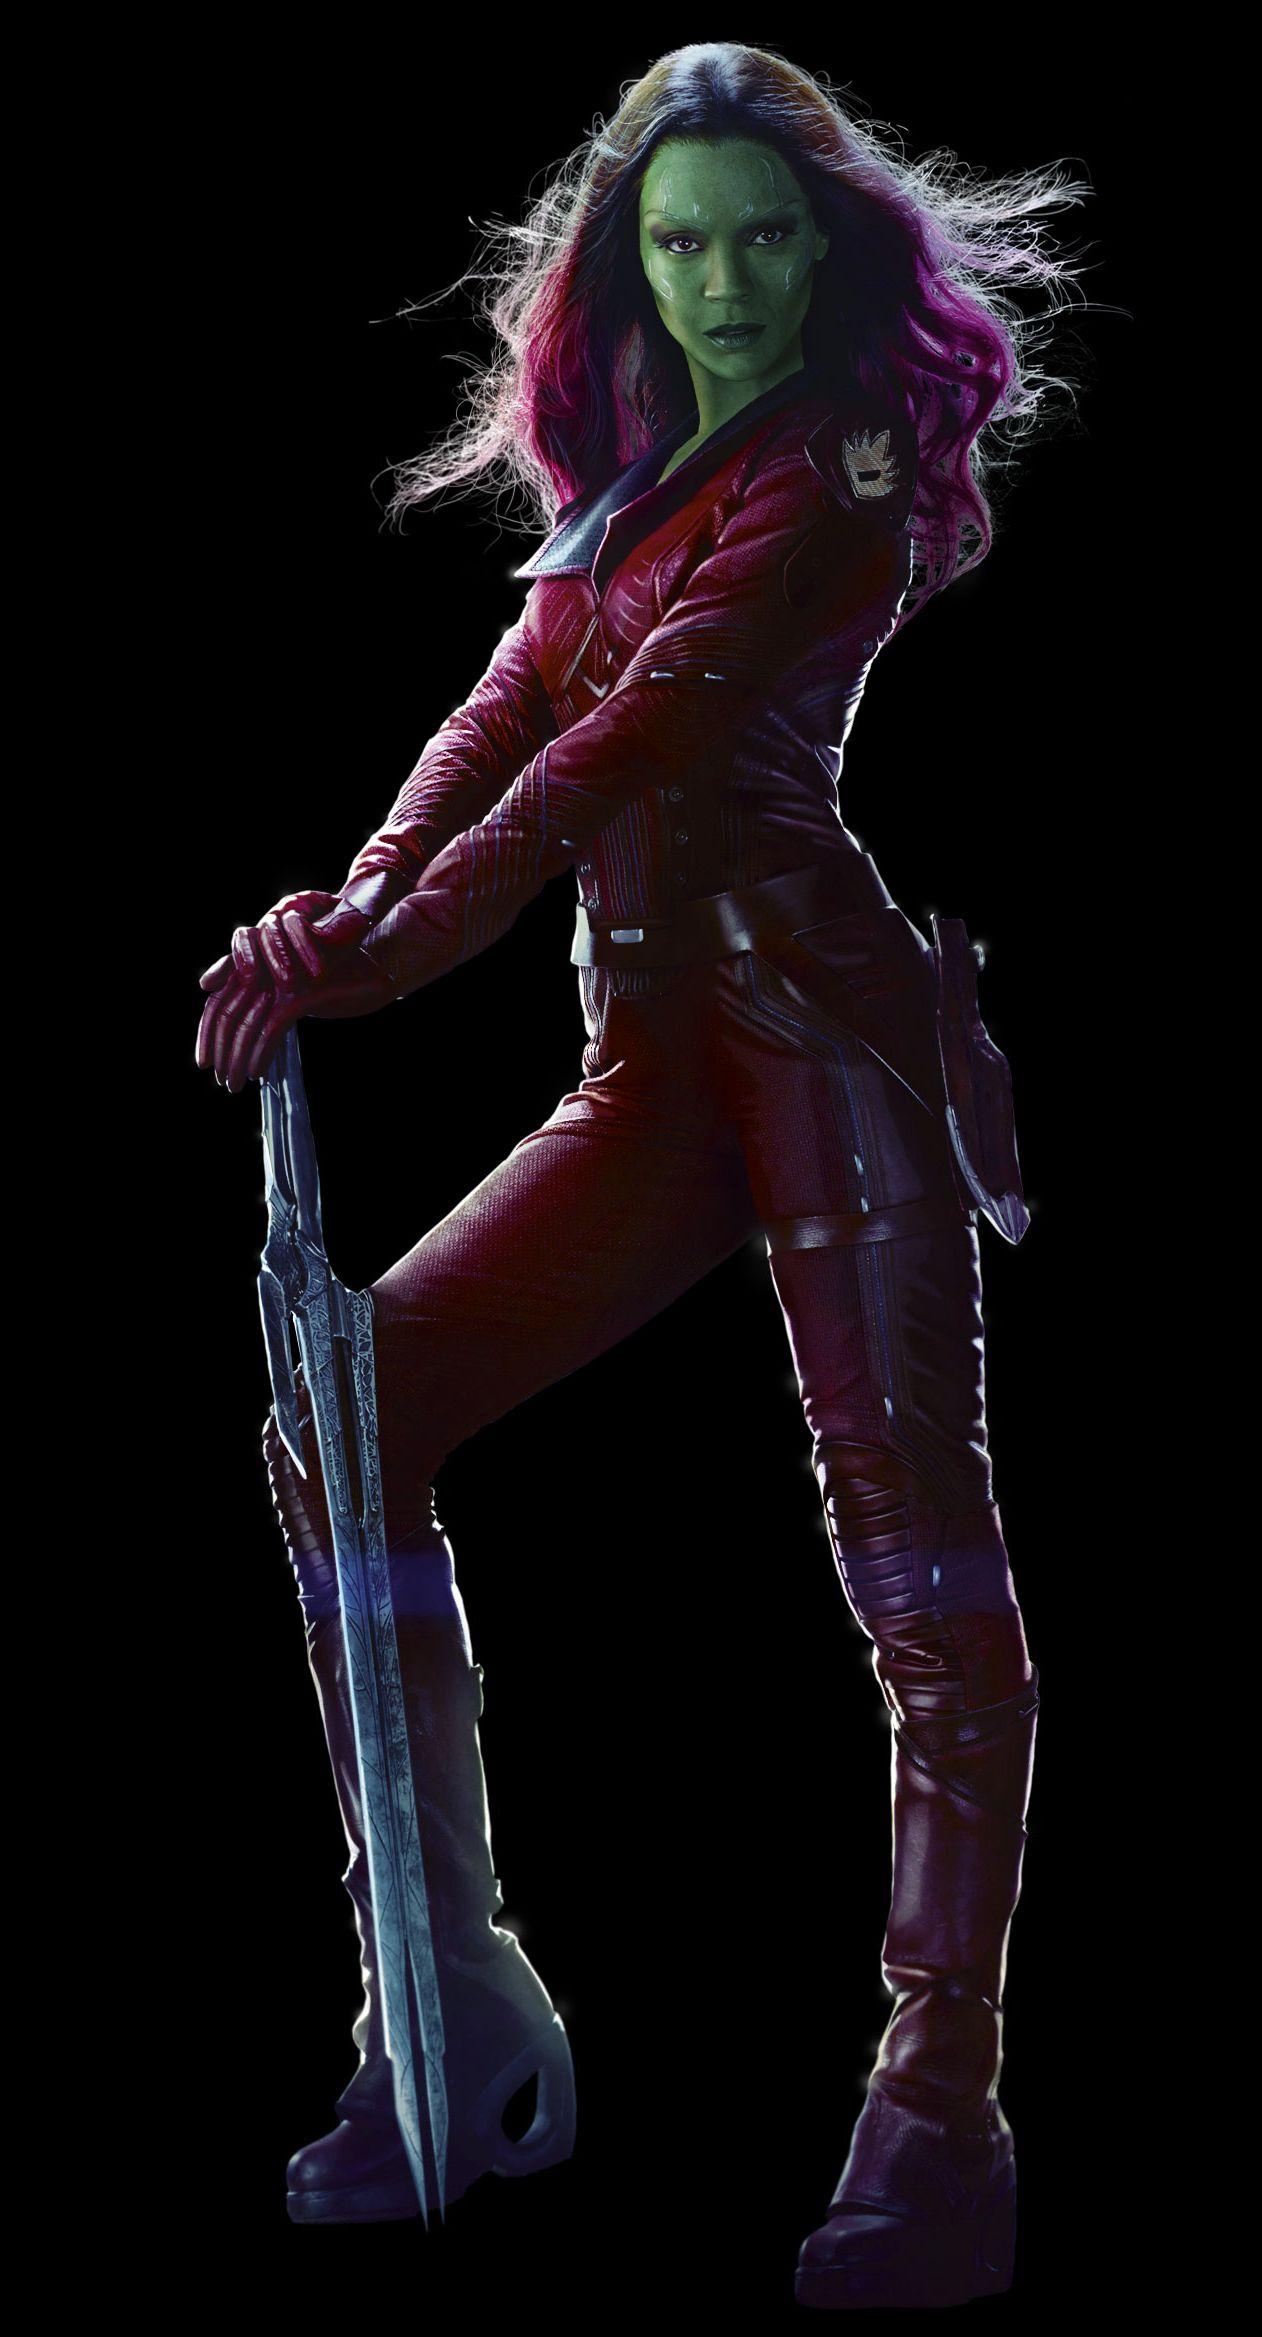 Zoe Saldana as Gamora character